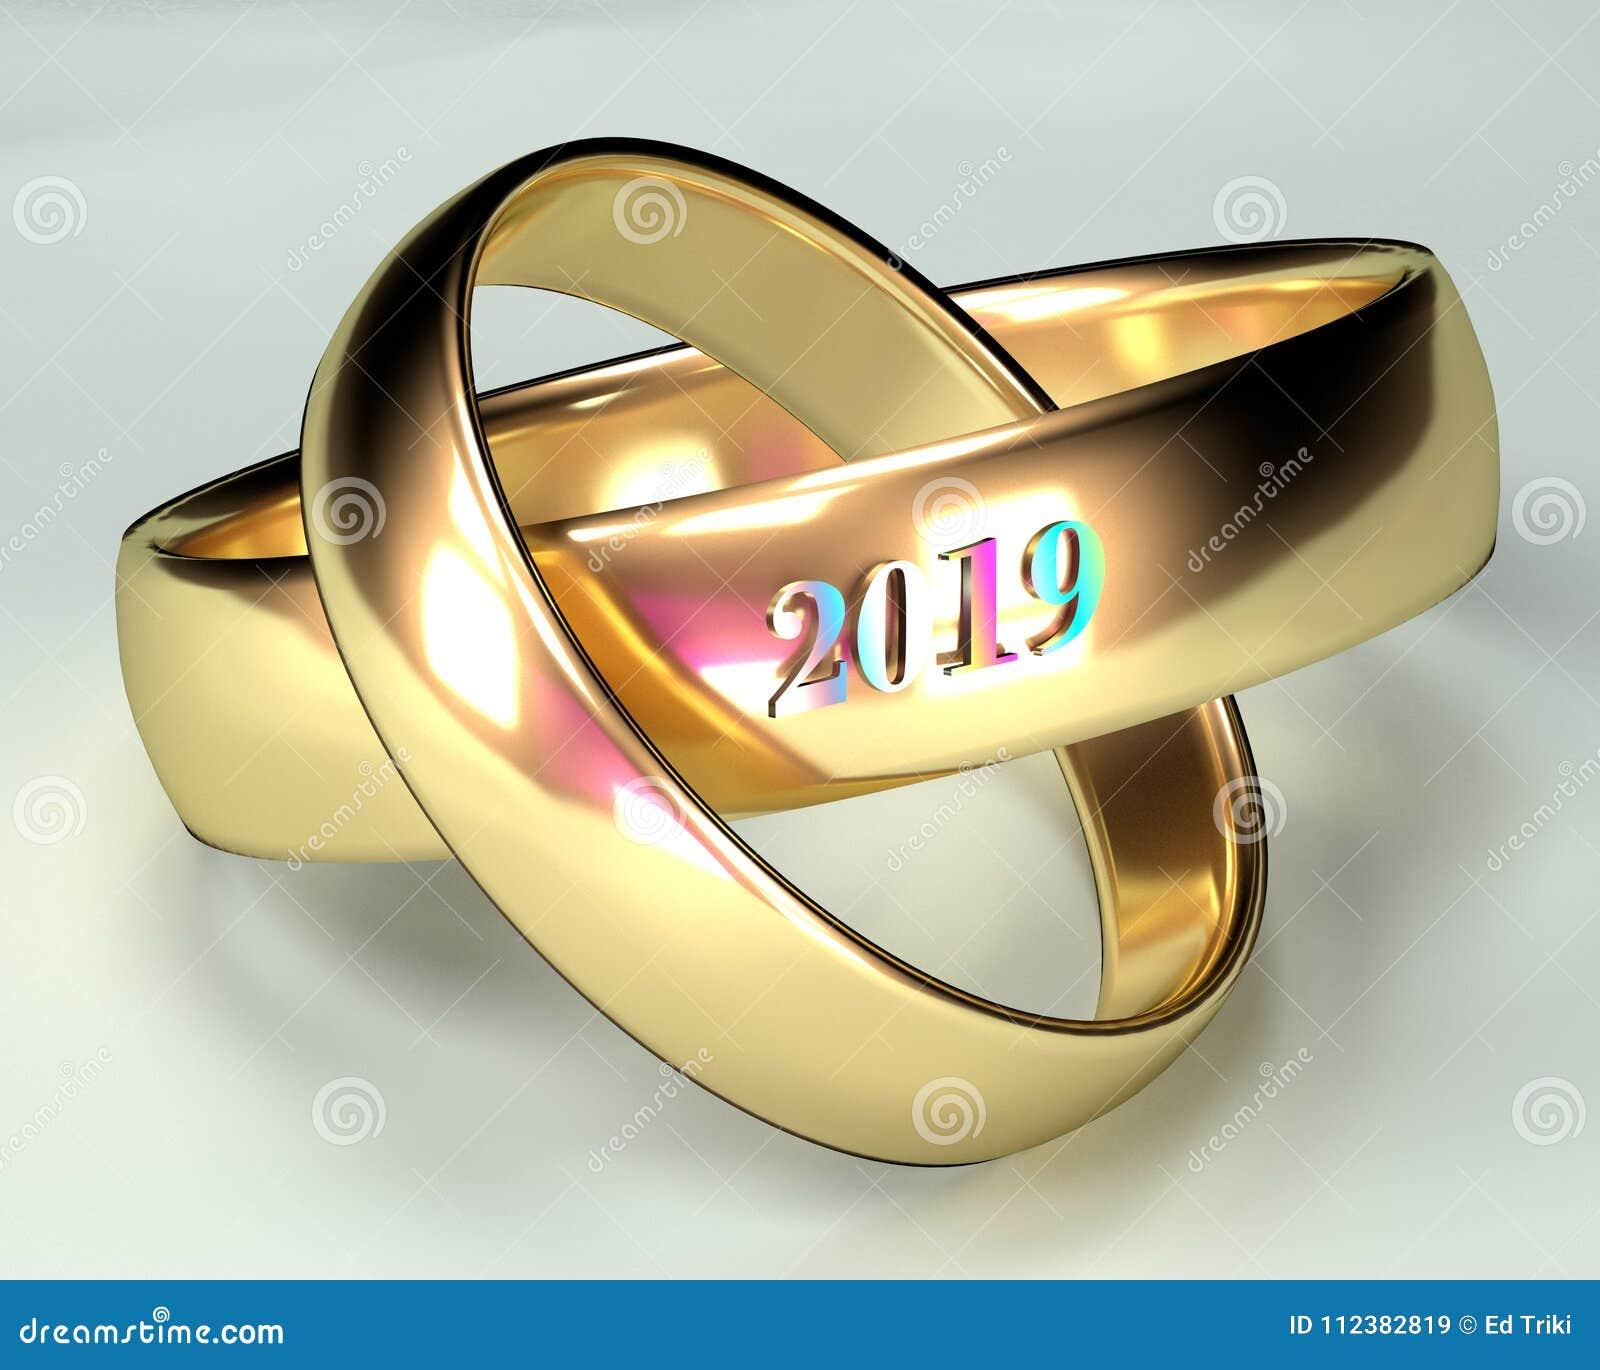 Wedding Rings Ceremony 2019 Stock Image Image Of Jewelry Band